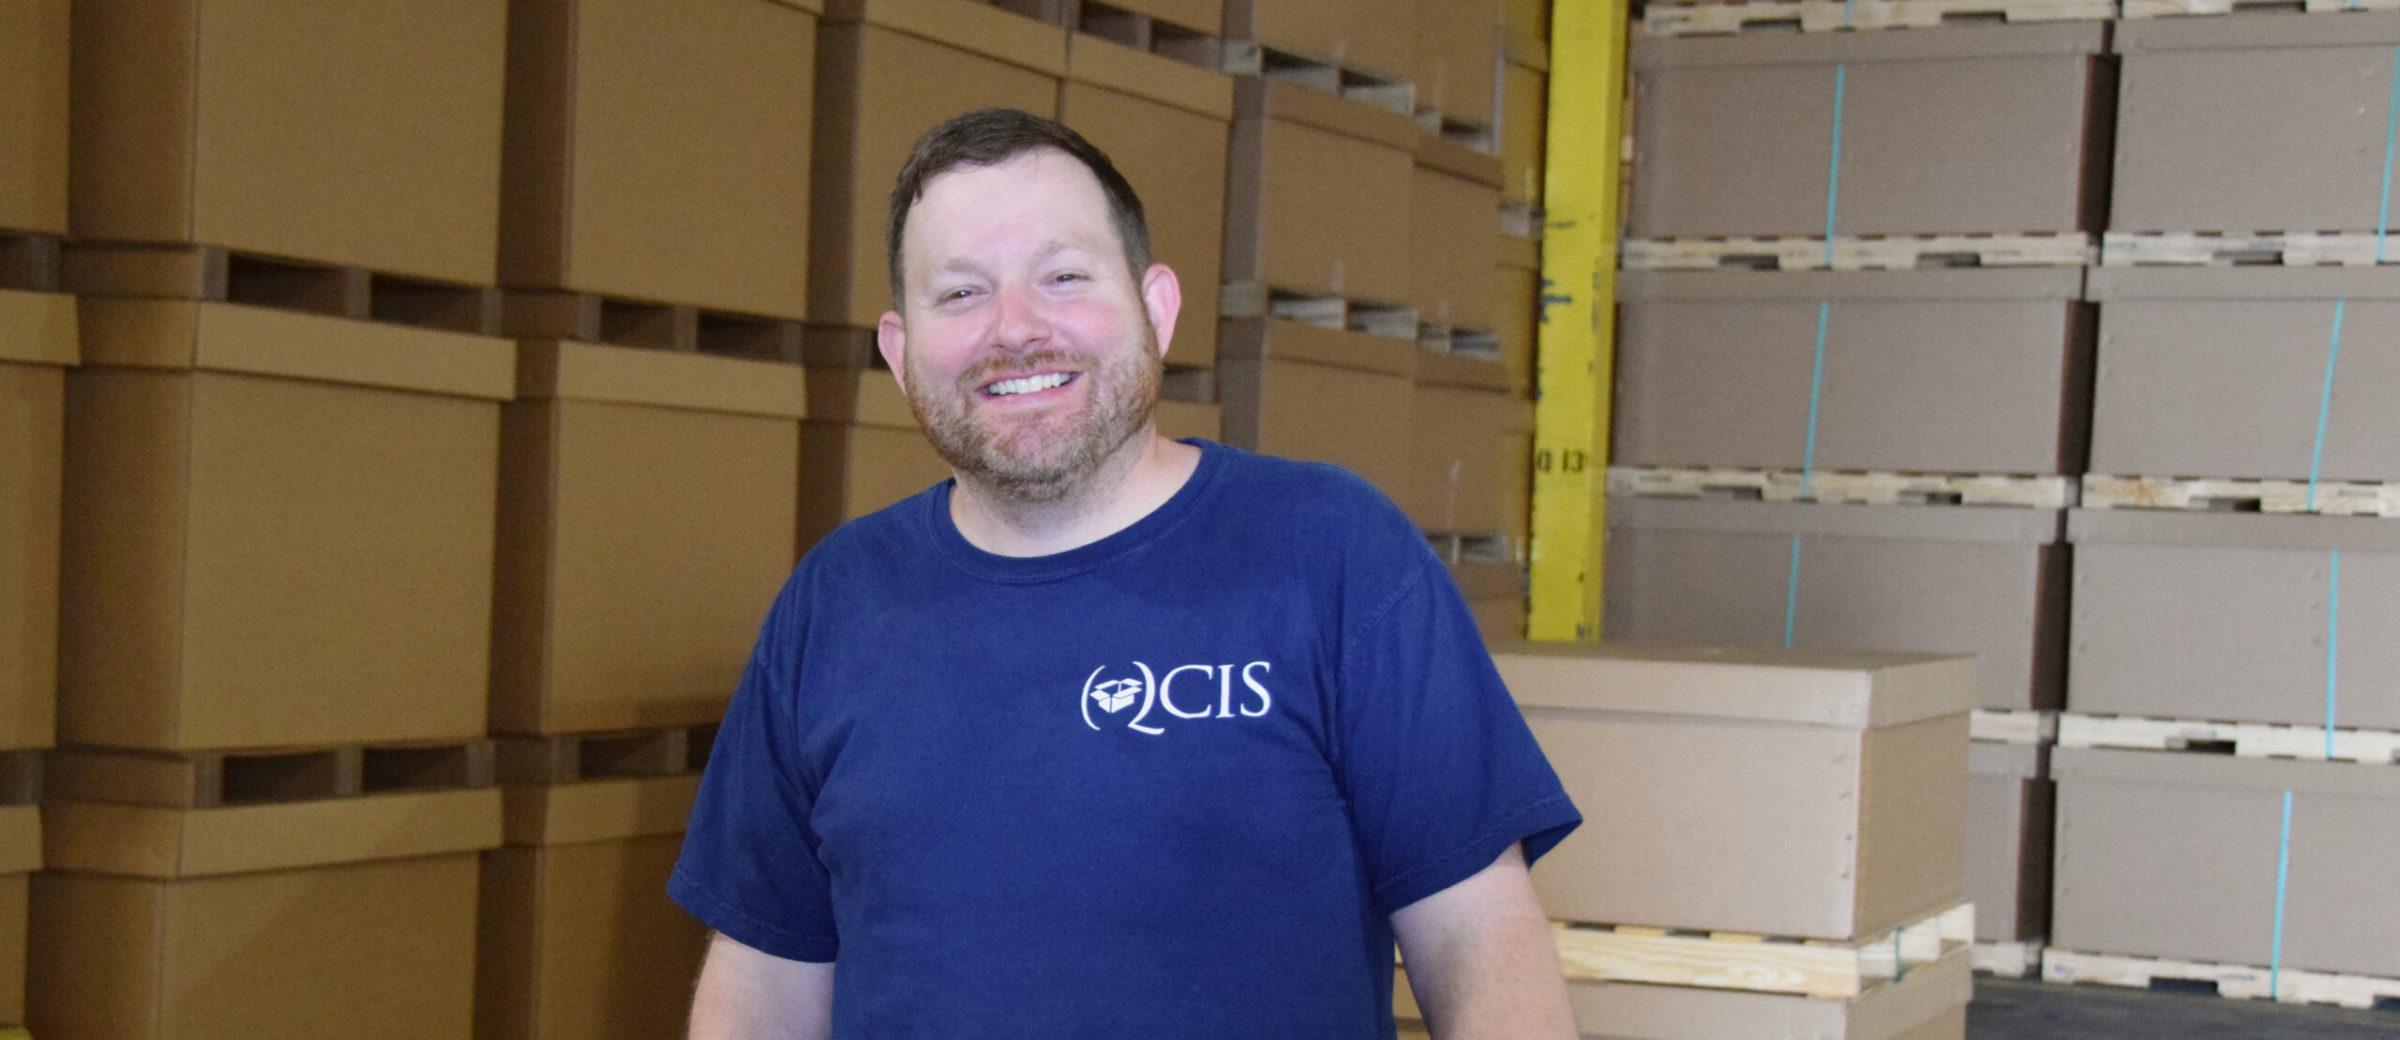 QC Industrial employee